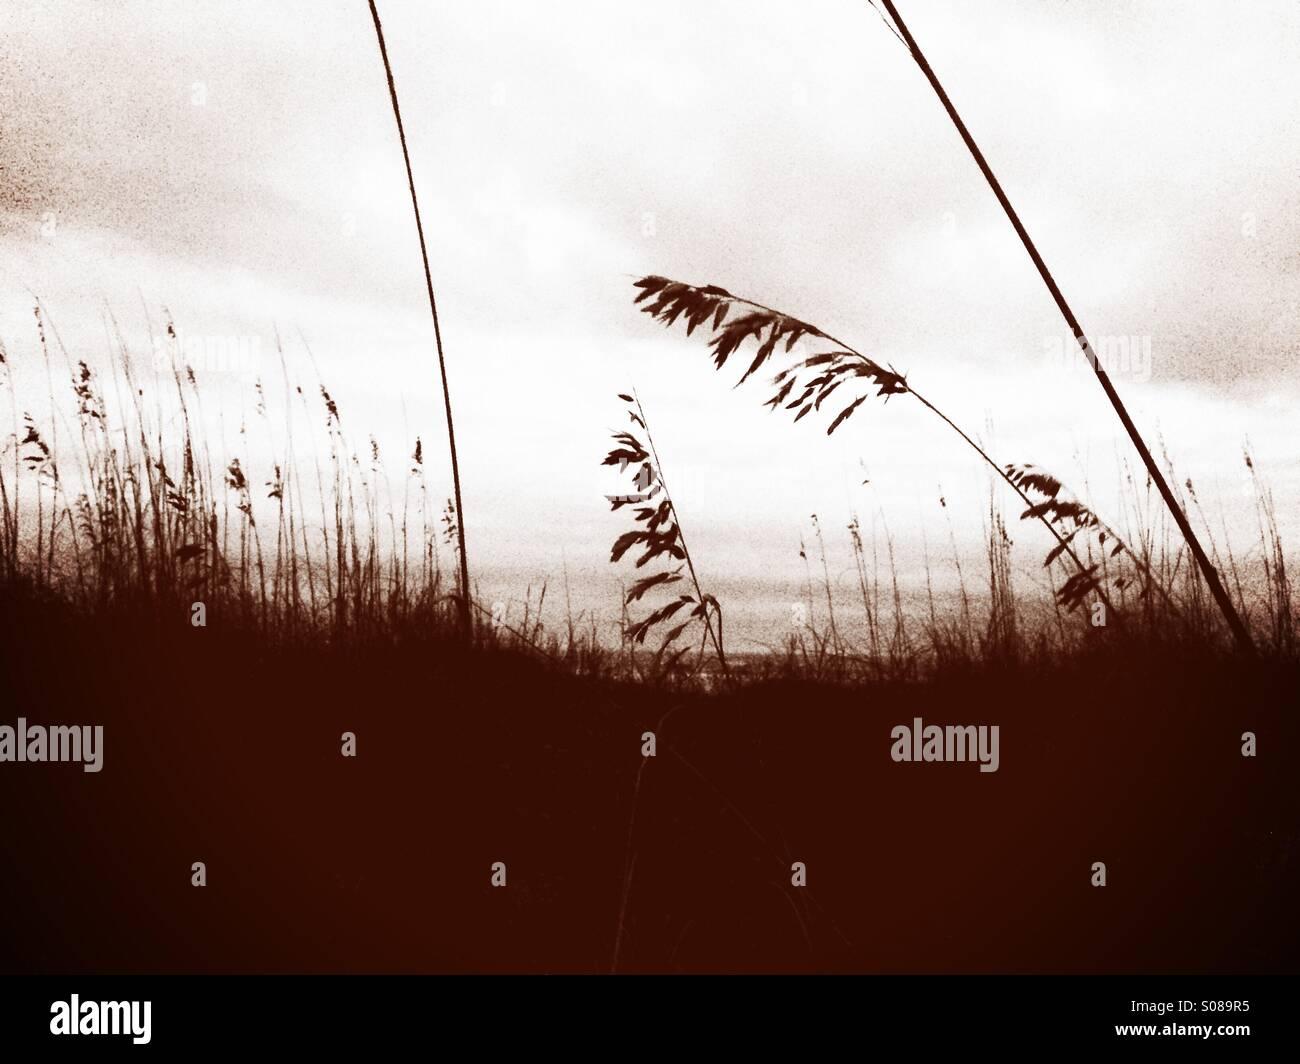 Sehafer sind gegen bedecktem Himmel in diesem Bild Sepia getönten Silhouette. Stockbild